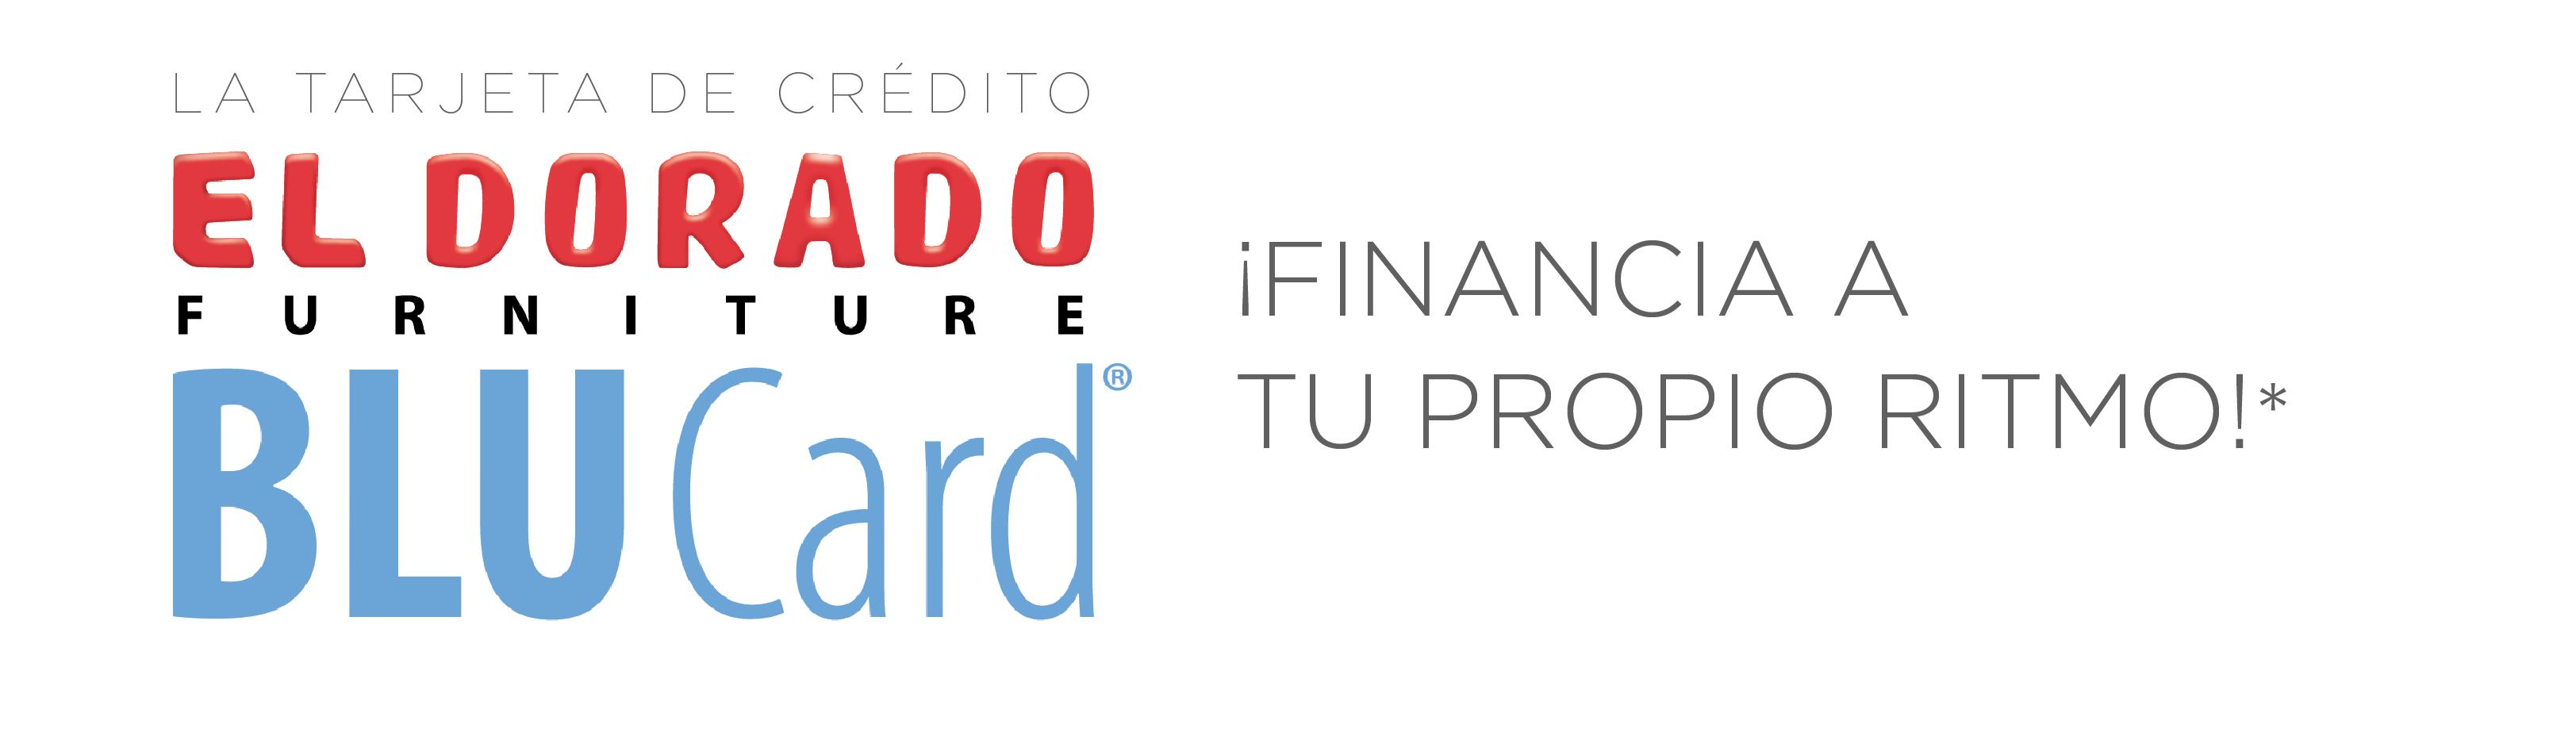 La Tarjeta de credito El Dorado Furniture BLUCard